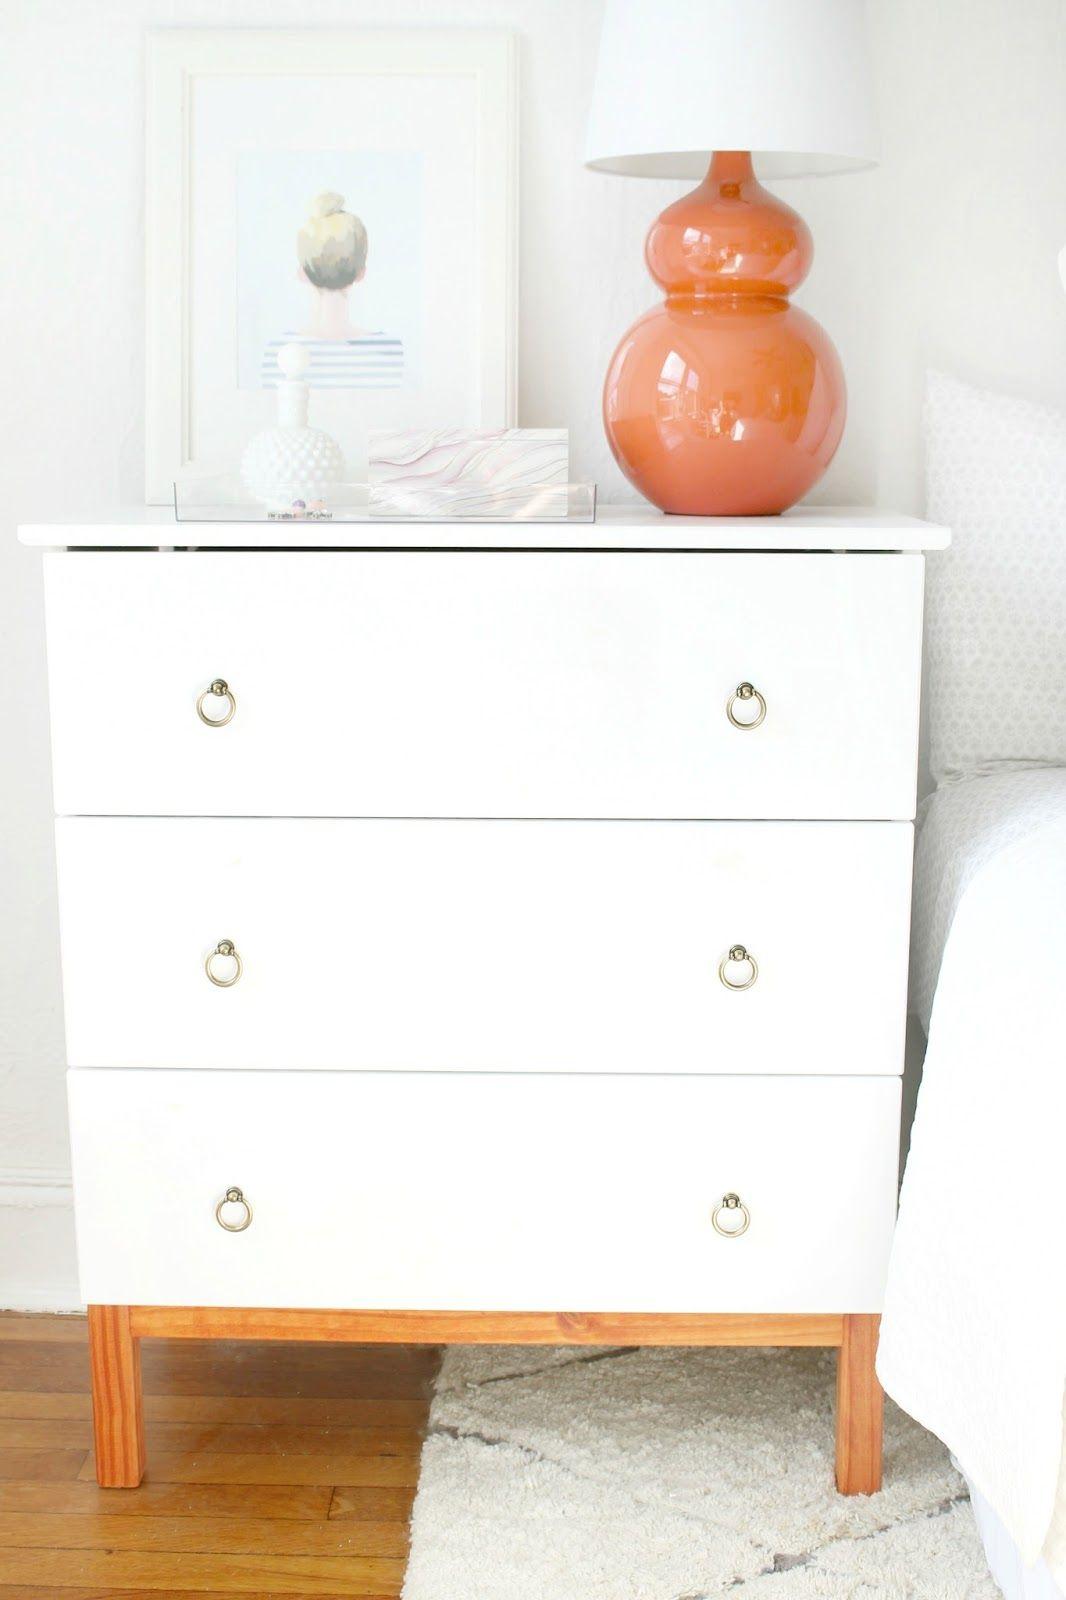 DIY Ikea Tarva Hack nightstands - Eine schicke weiße IKEA Kommode ...